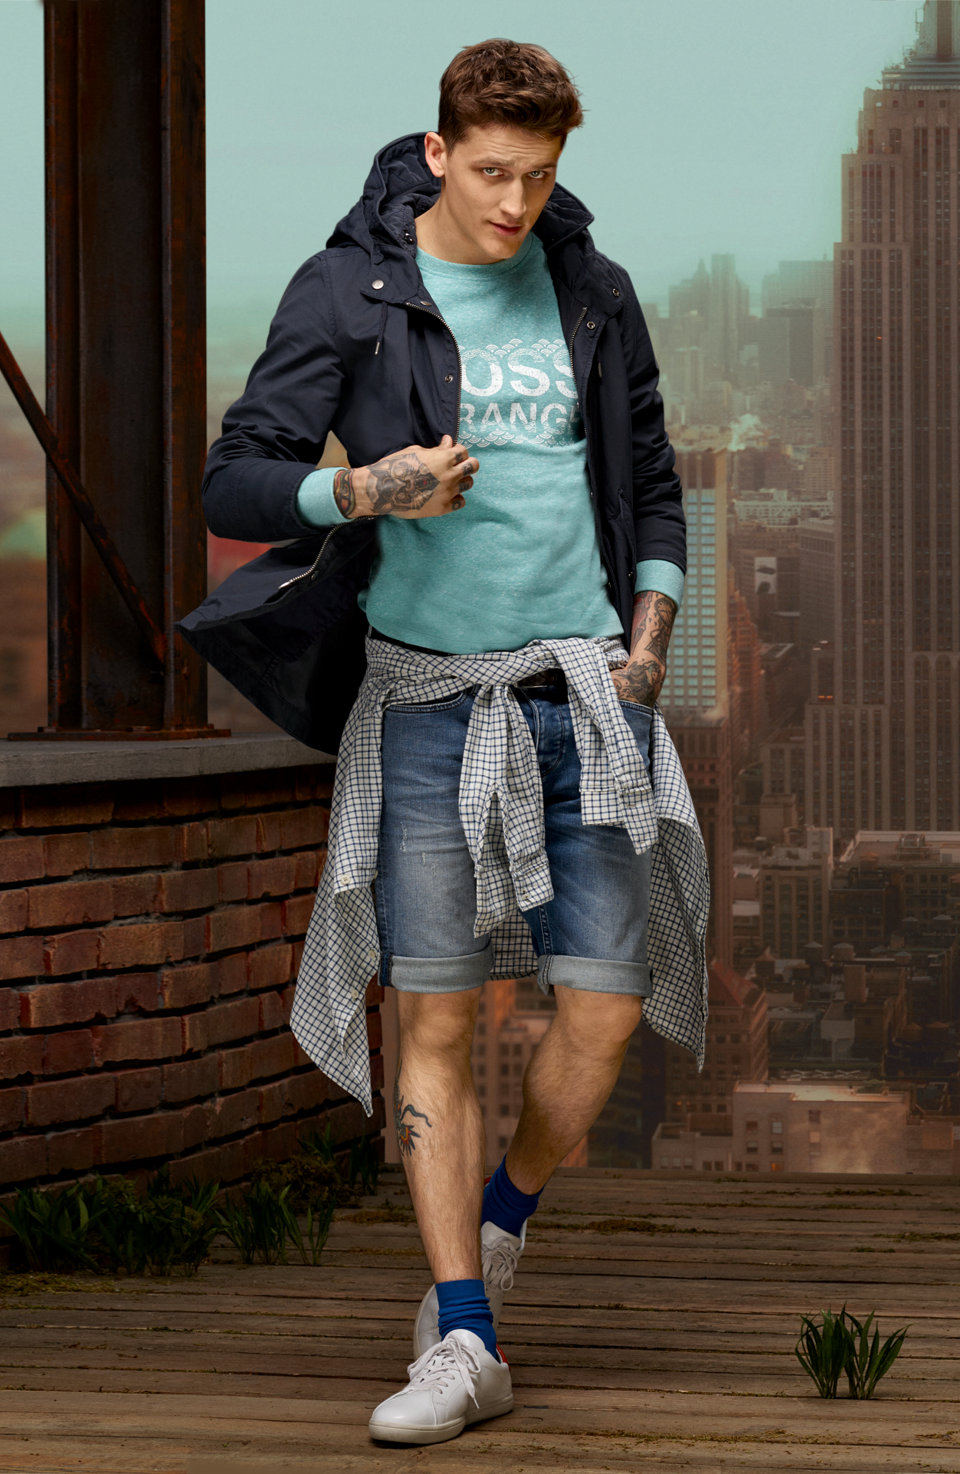 Dark blue outerwear, green sweatshirt and blue jeans byBOSSOrange